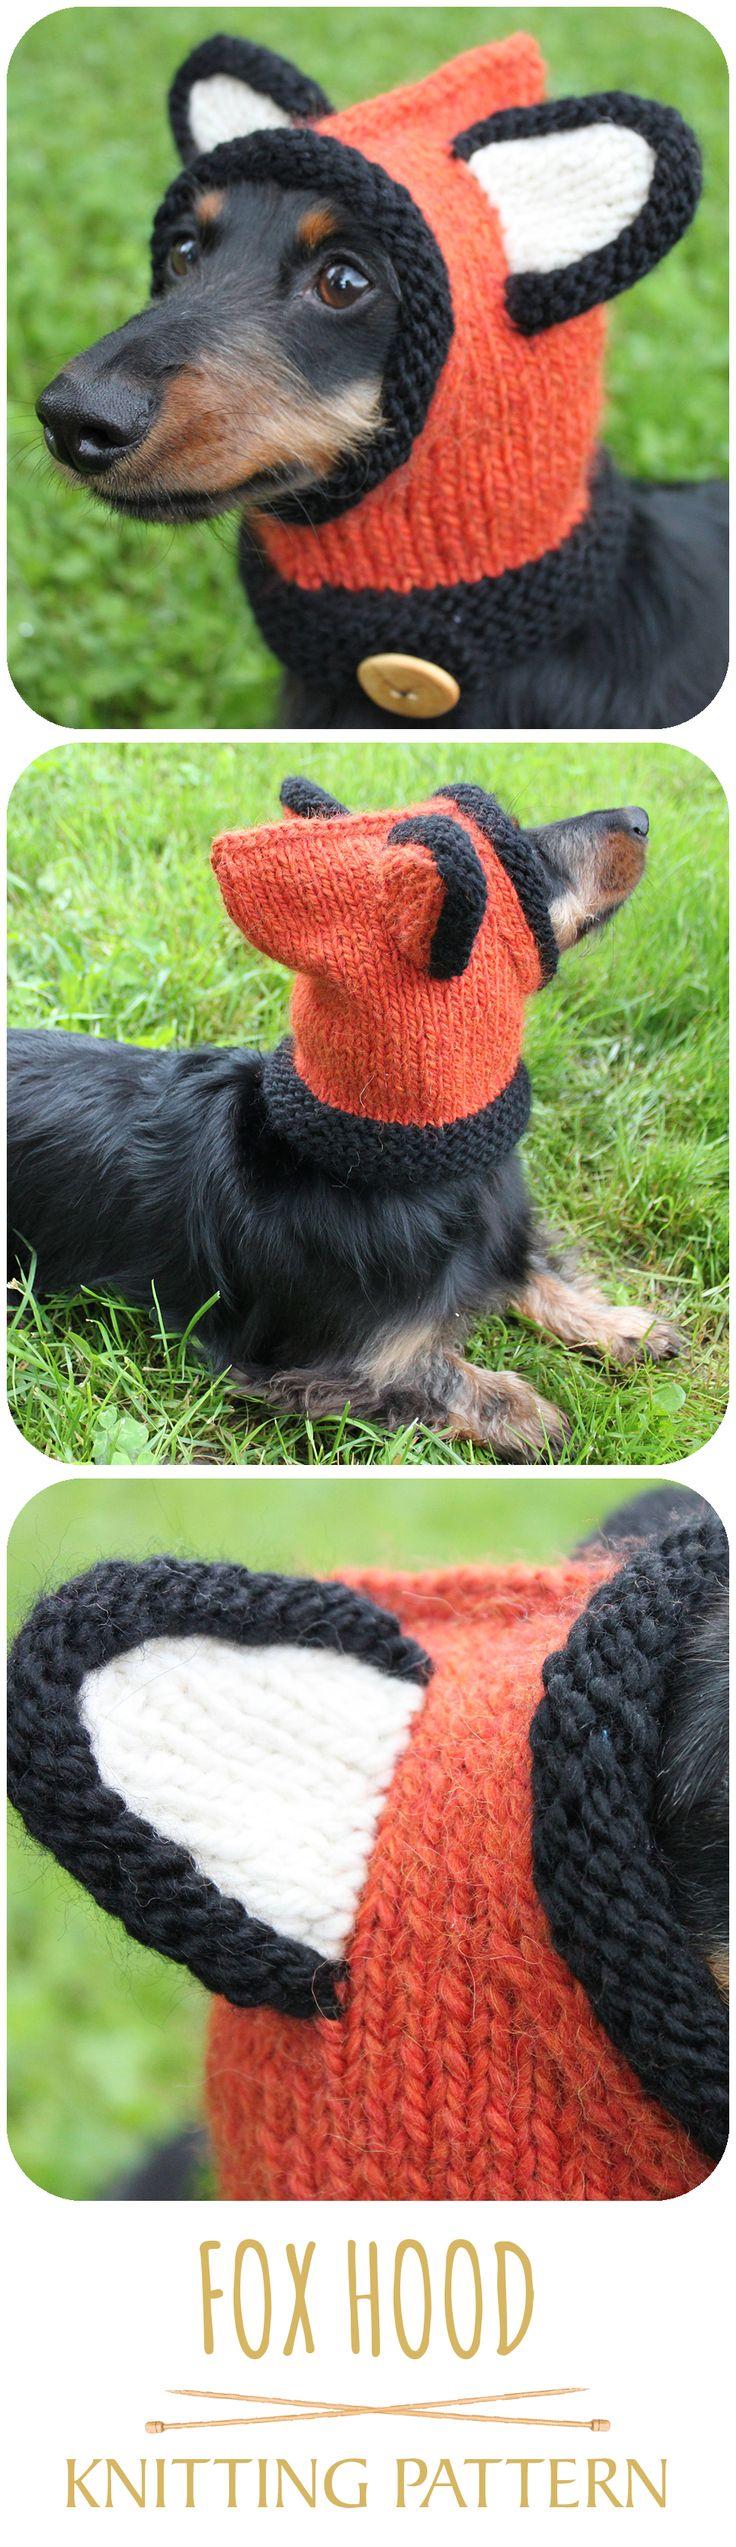 Knitted fox hood for a mini dachshund! LOL! #dog #cuteanimals #cutedogs #foxhood #knittingpattern #smalldoghat #doghat #dachshund #minidachshund